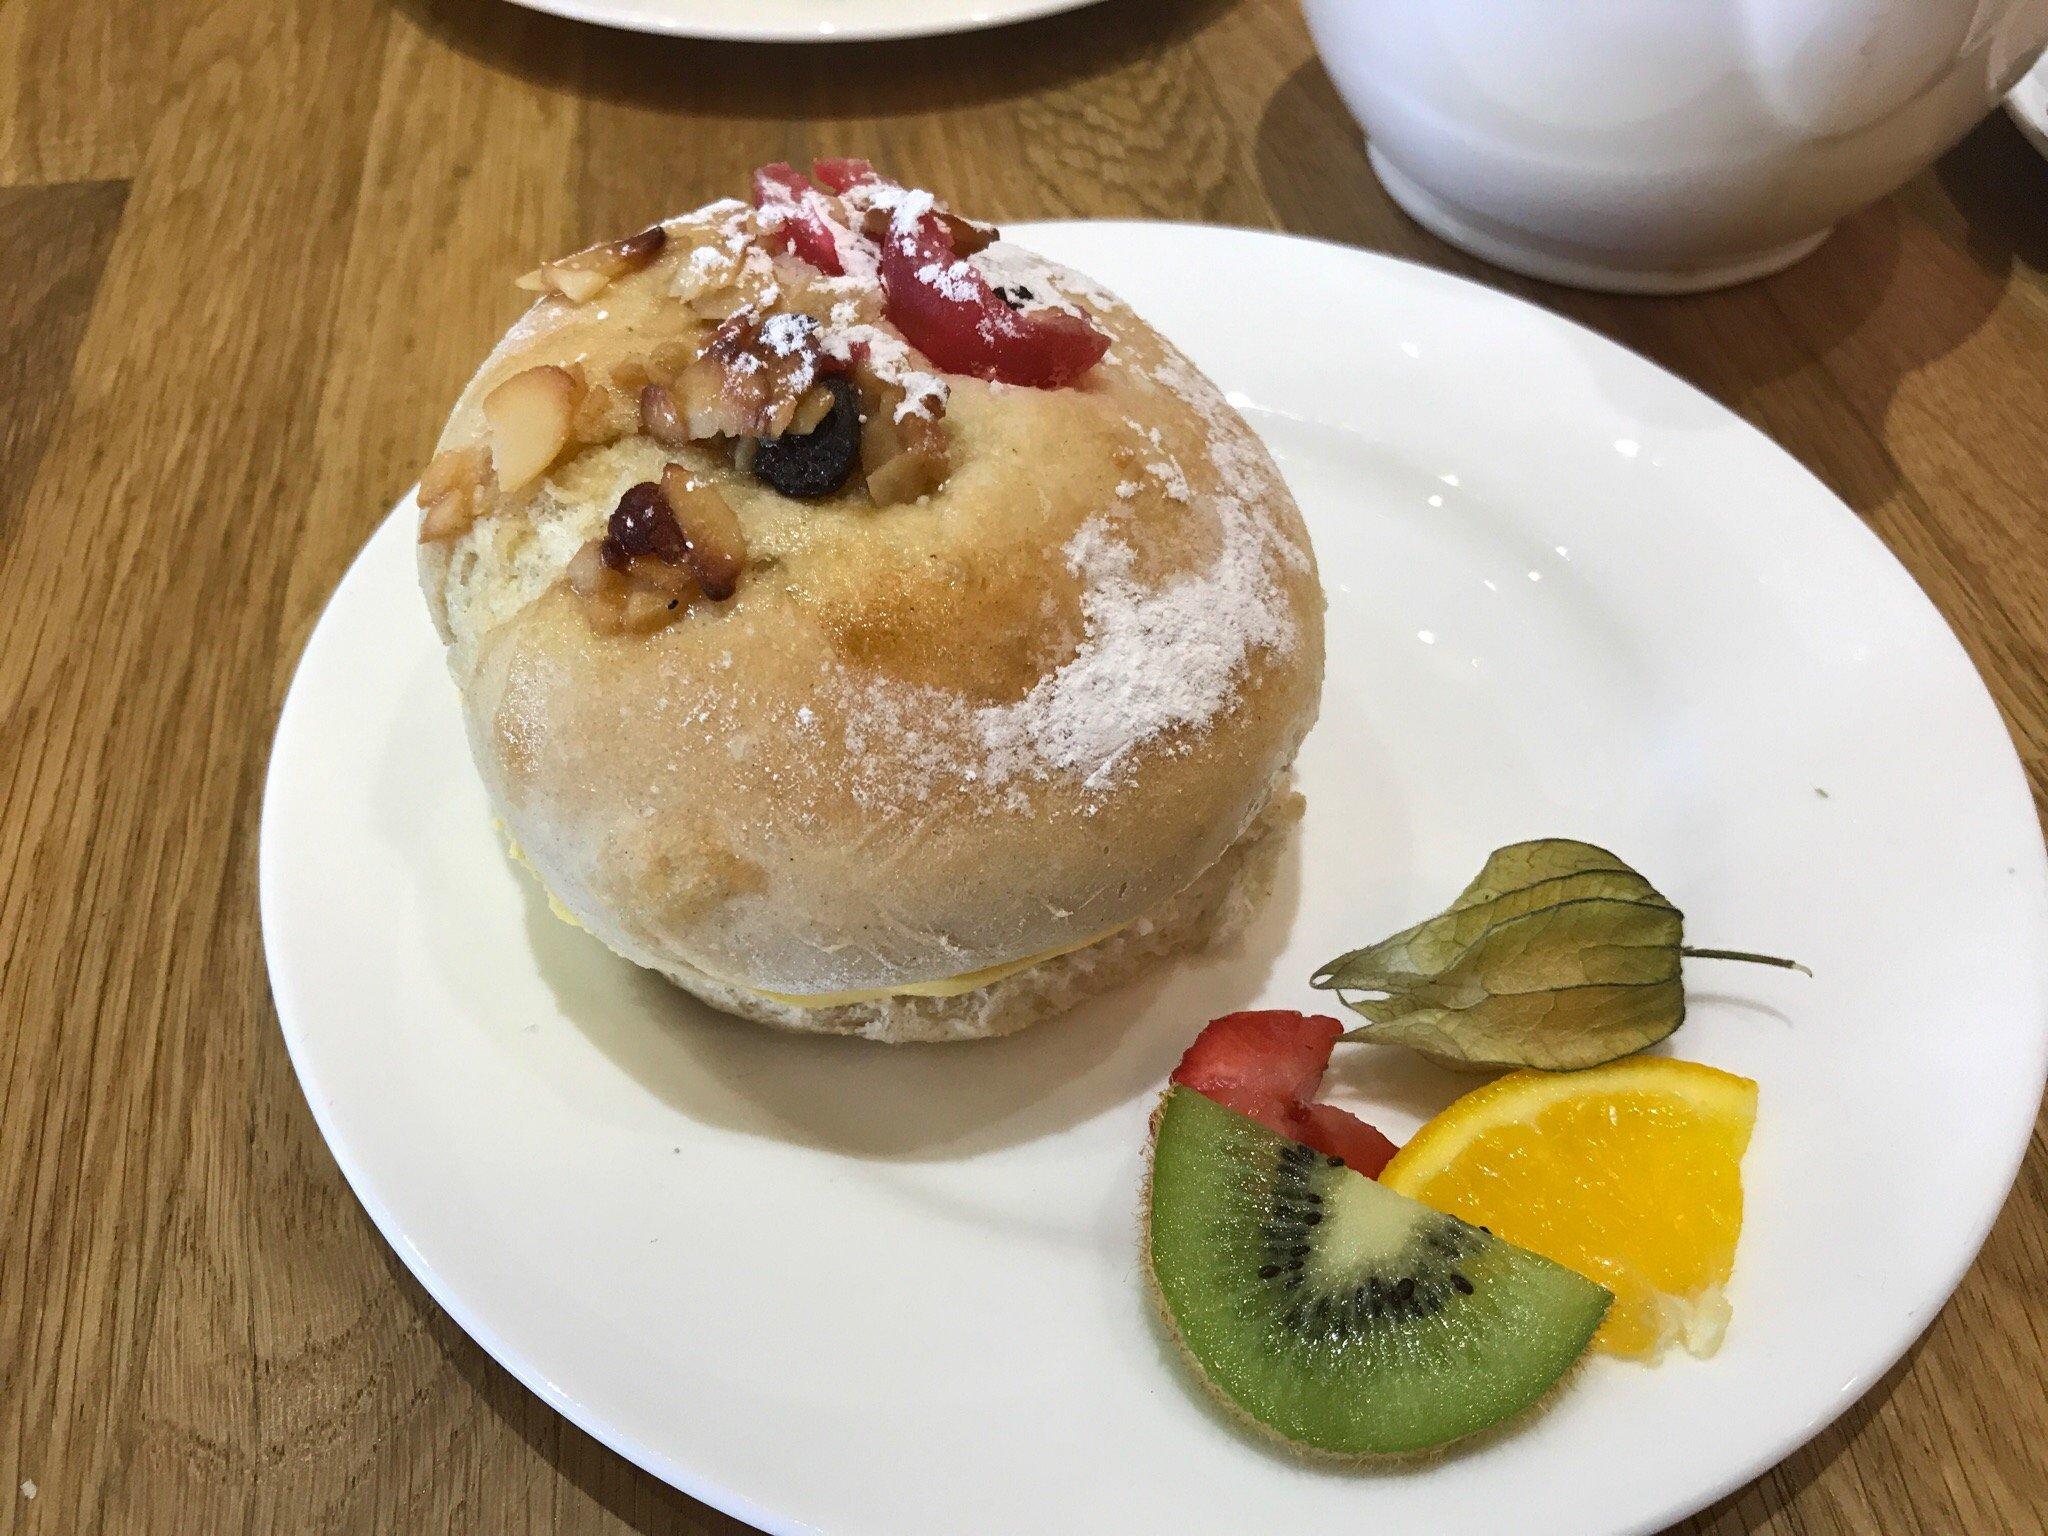 The Hazelmere Tea House Restaurant & Artisan Bakery | 1-2 Yewbarrow Terrace, Grange-Over-Sands LA11 6ED | +44 15395 32972